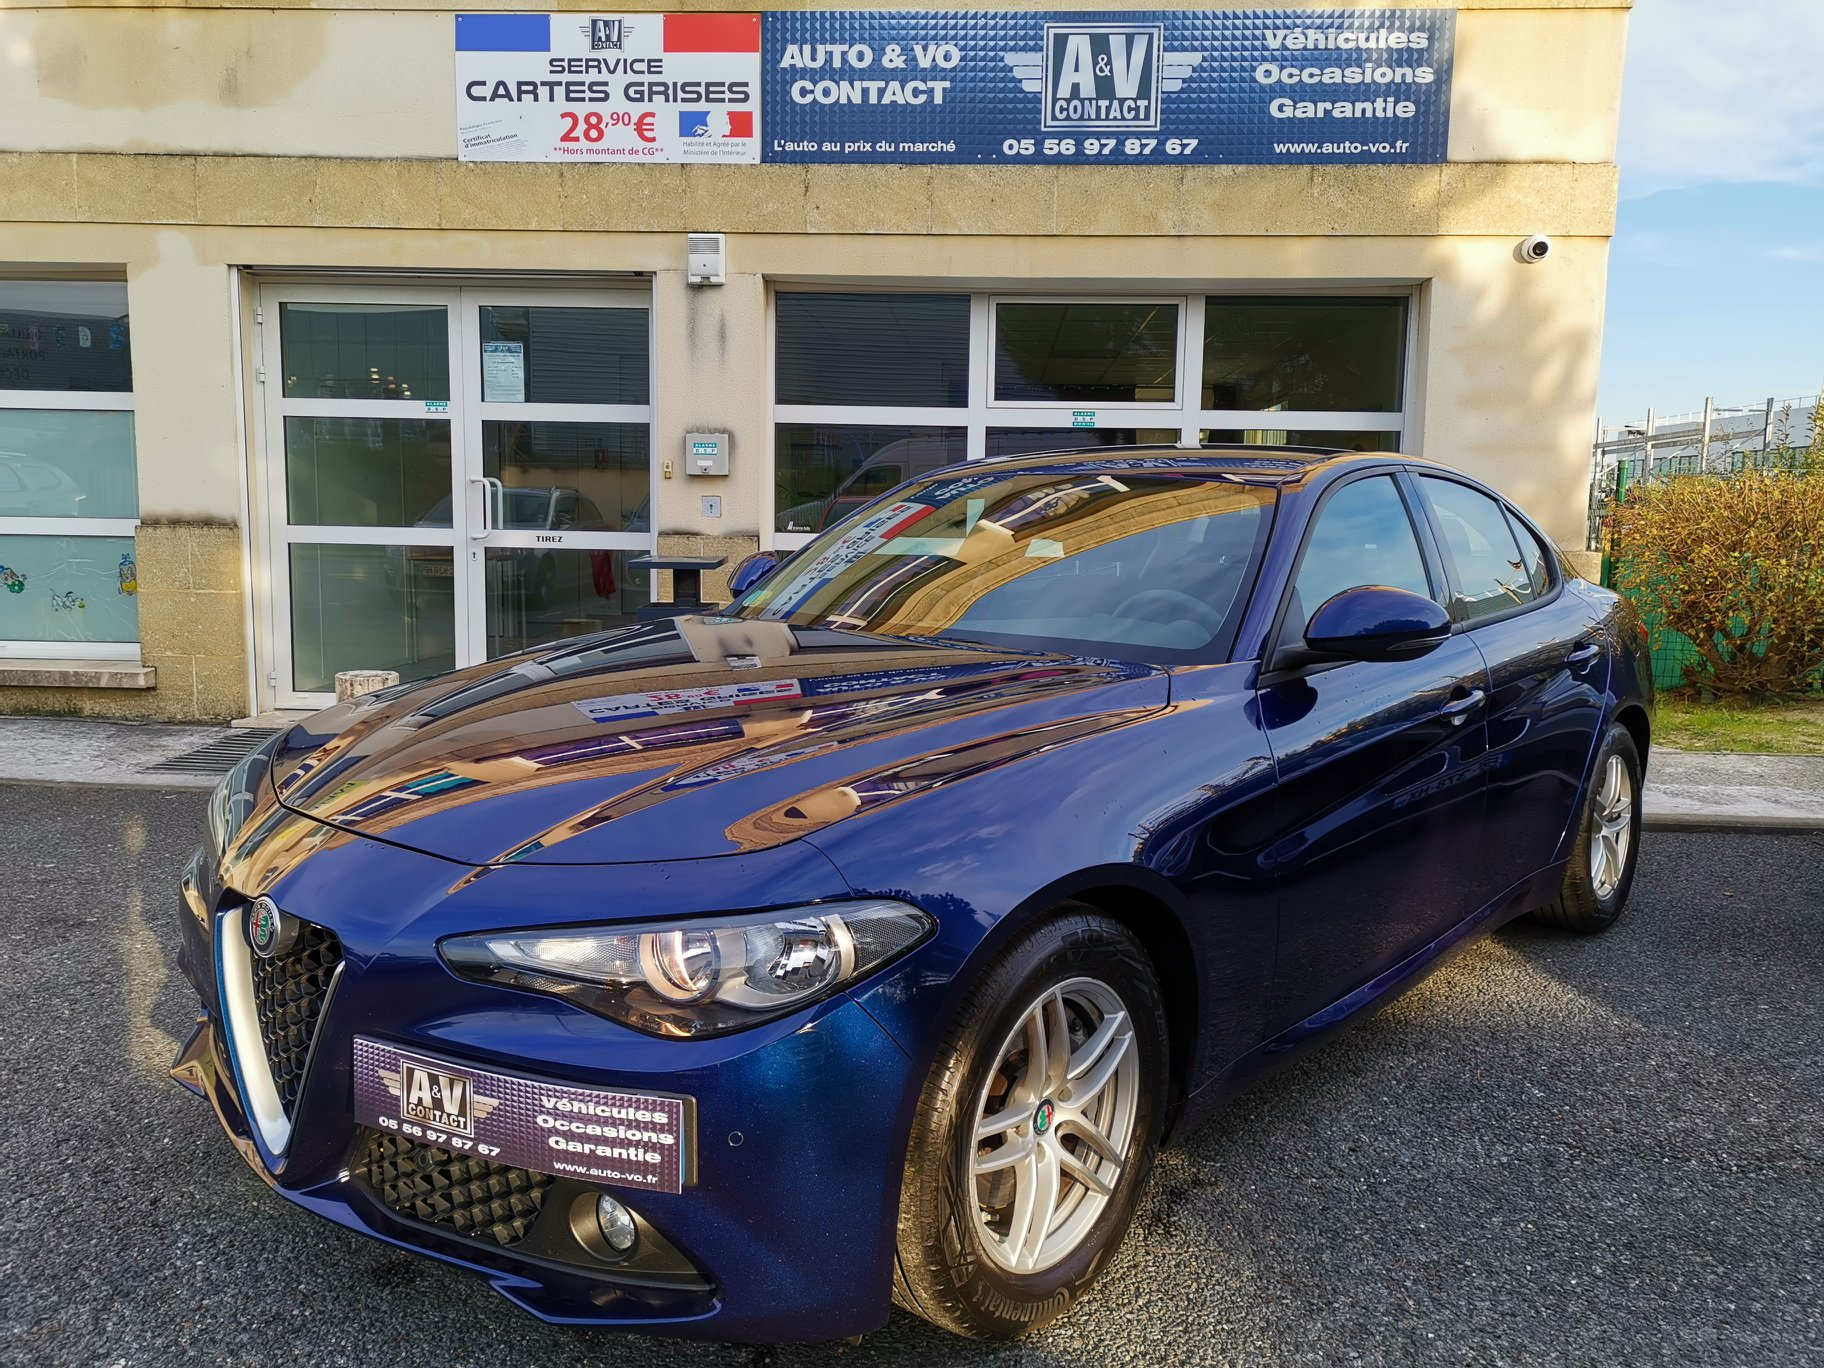 ALFA ROMEO GIULIA 2.2L JTD 16V 150 CH Du 02.09.2016 – 58 540 KMS – 19 790€